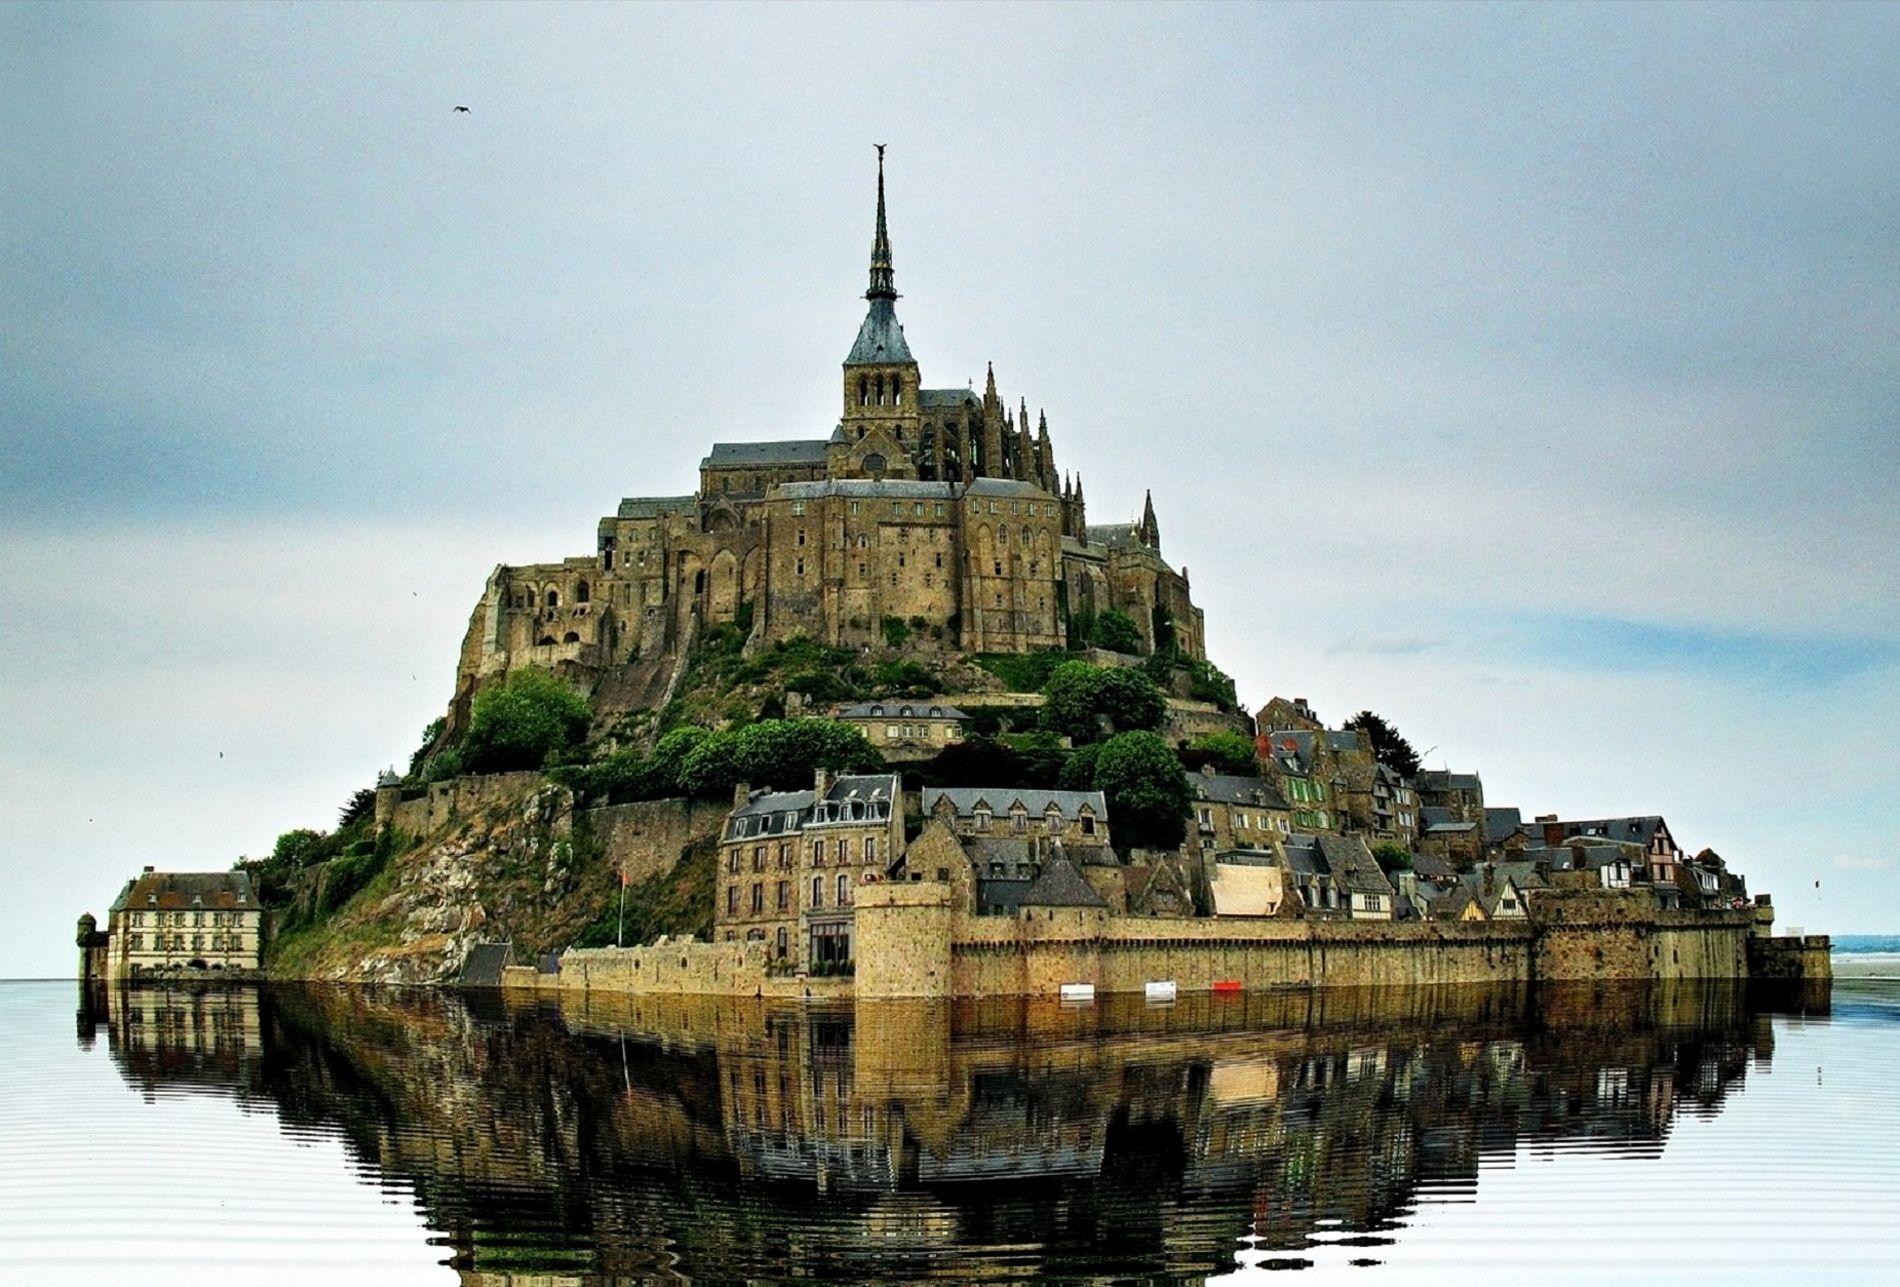 Le Mont Saint Michel Basse Normandie France Best Vacation Destinations Places To See Best Vacations